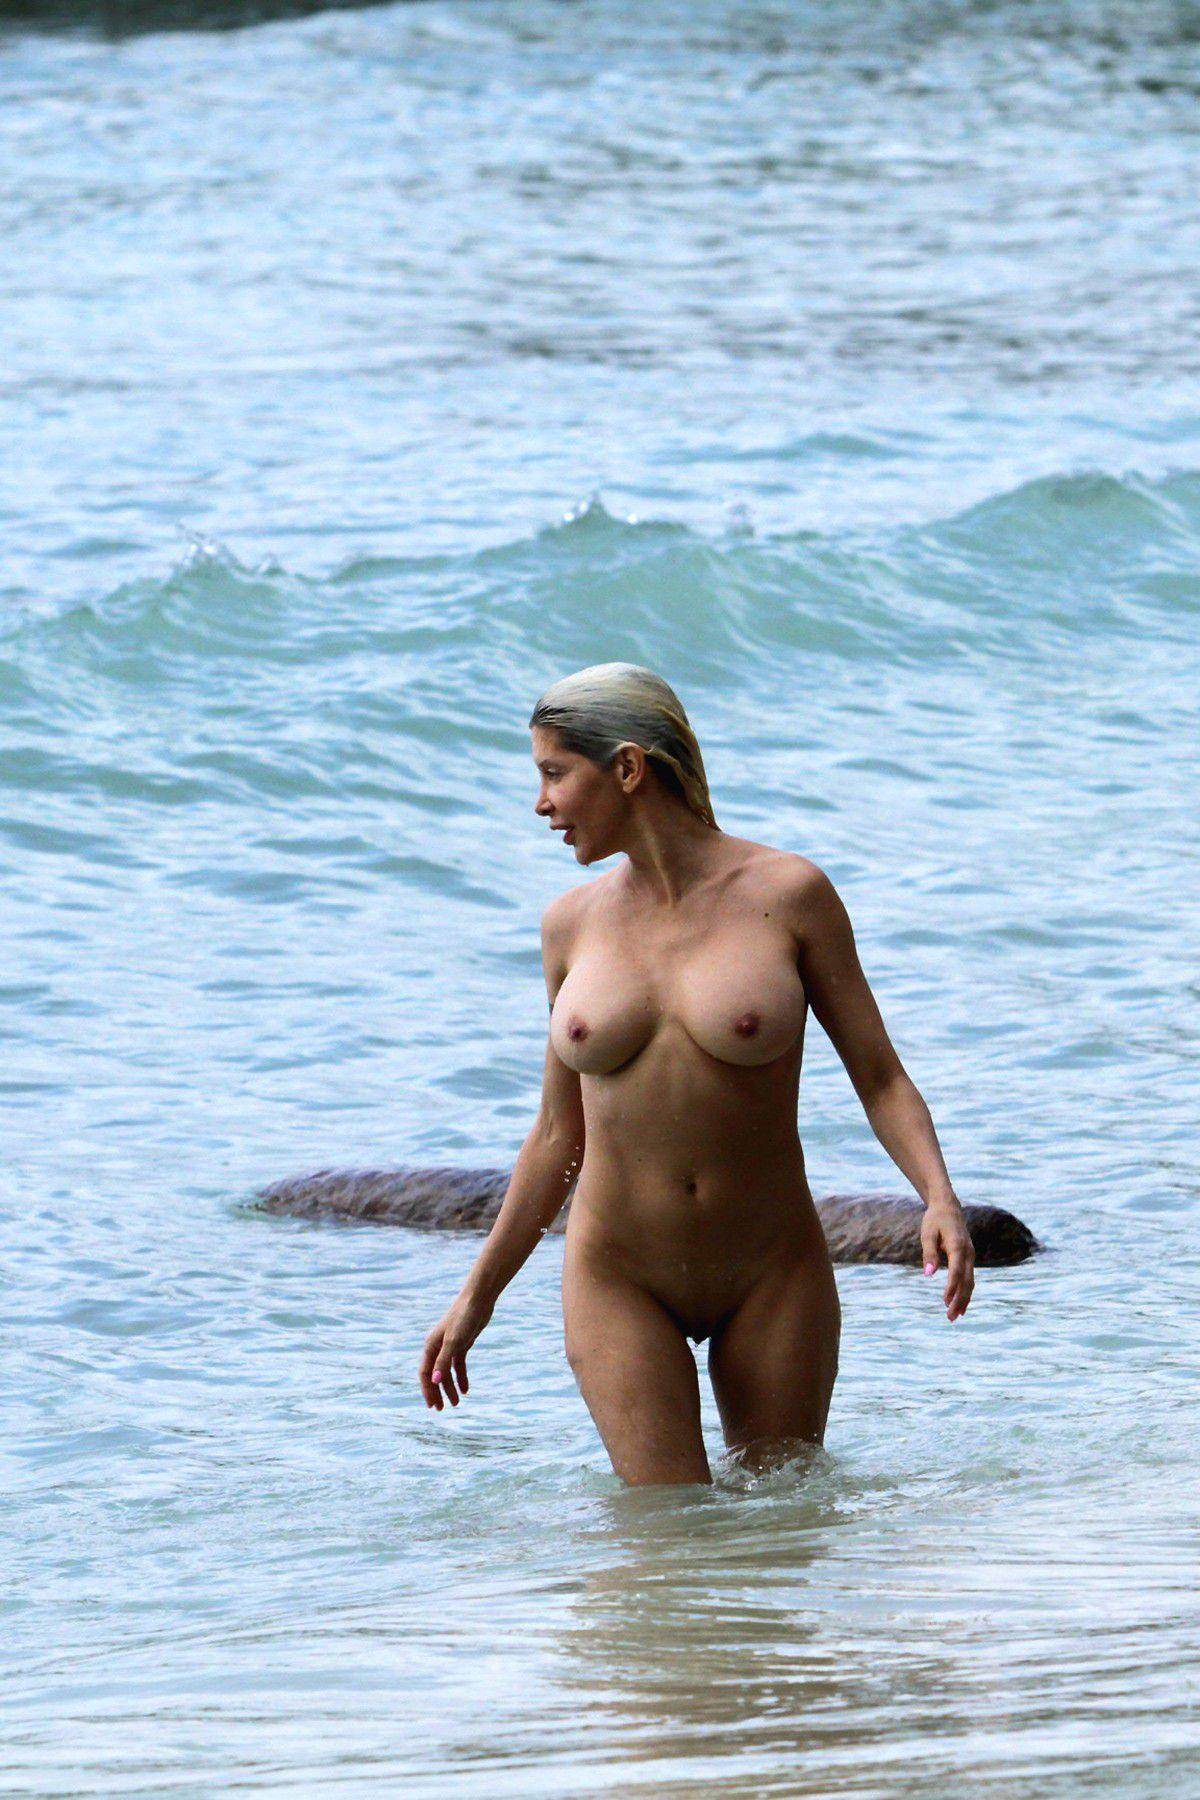 Angelique Morgan Porn Pics angelique-morgan-naked-on-the-beach-in-hawaii-24 | celebrity